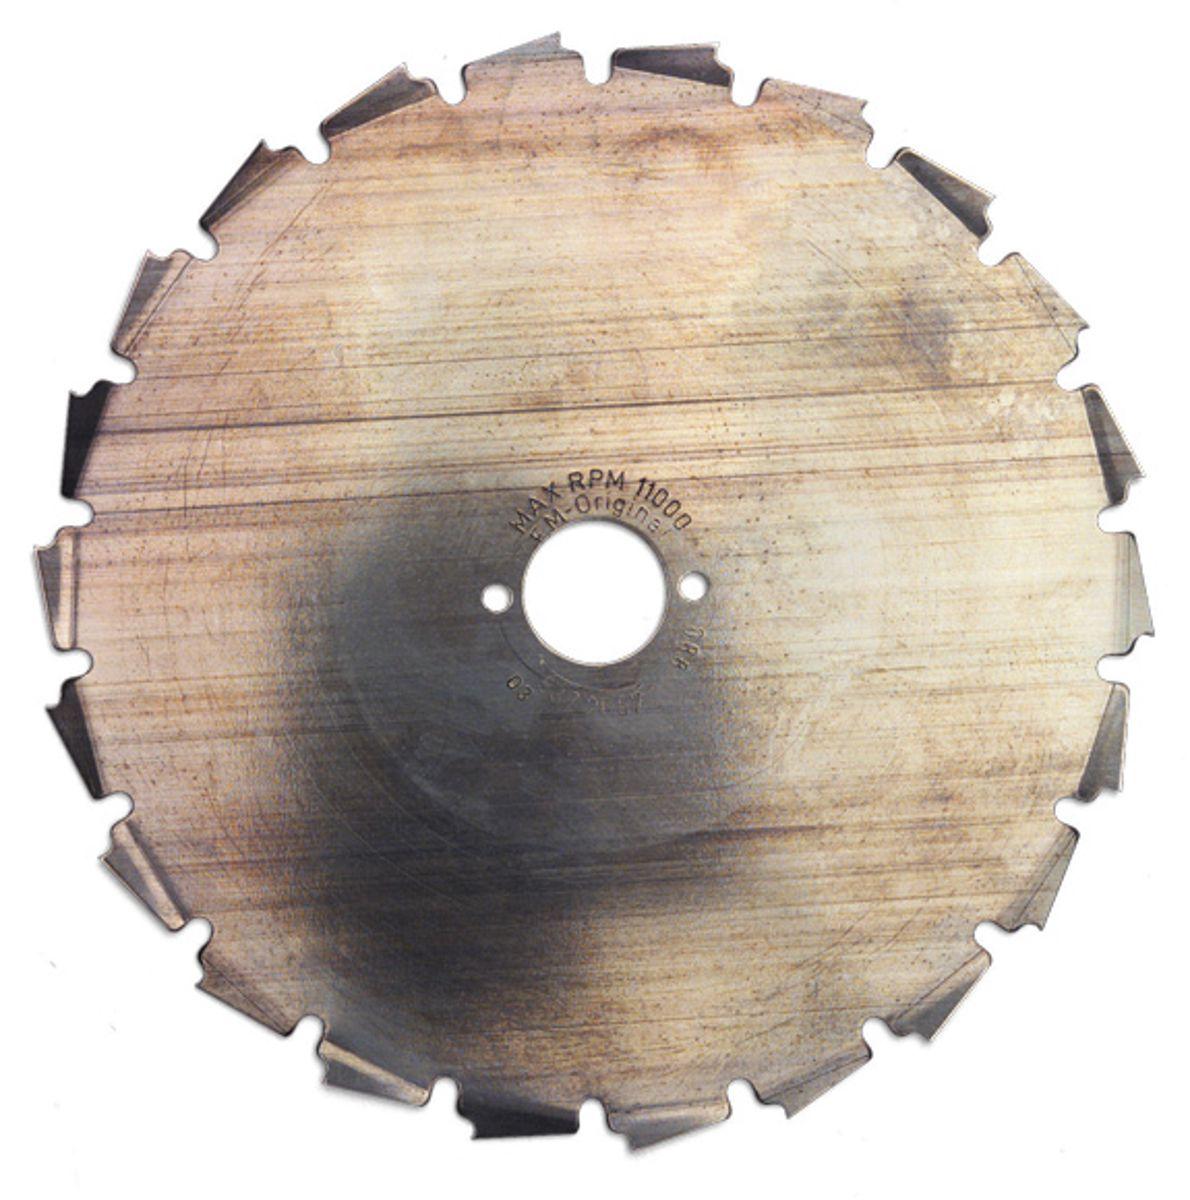 Husqvarna maxi 26-tands 200mm 25.4mm